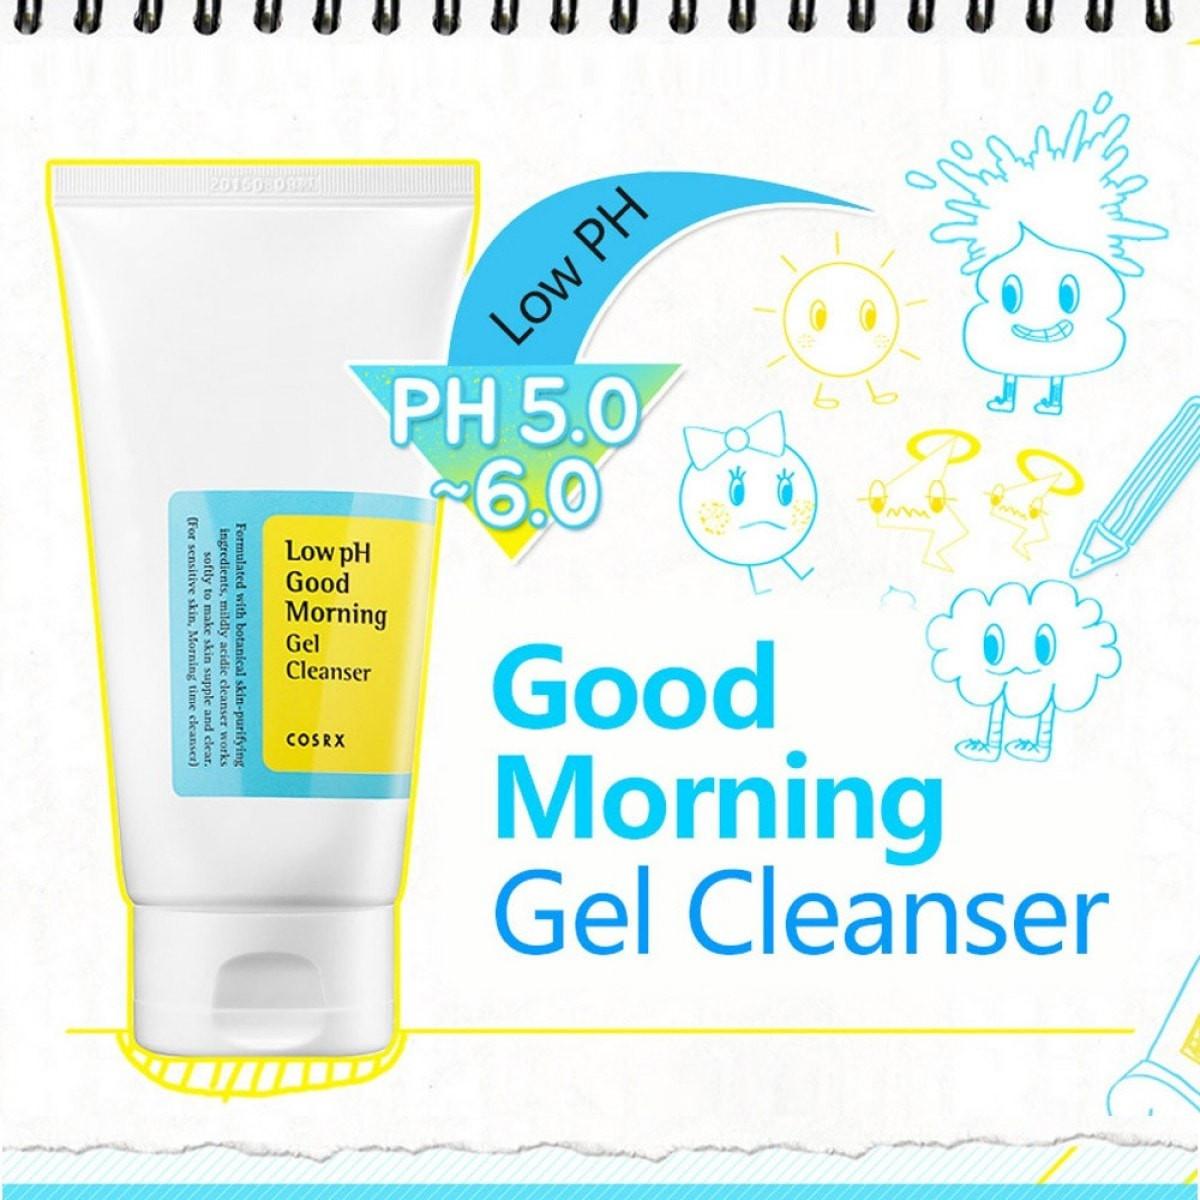 Low pH Good Morning Gel Cleanser [COSRX]